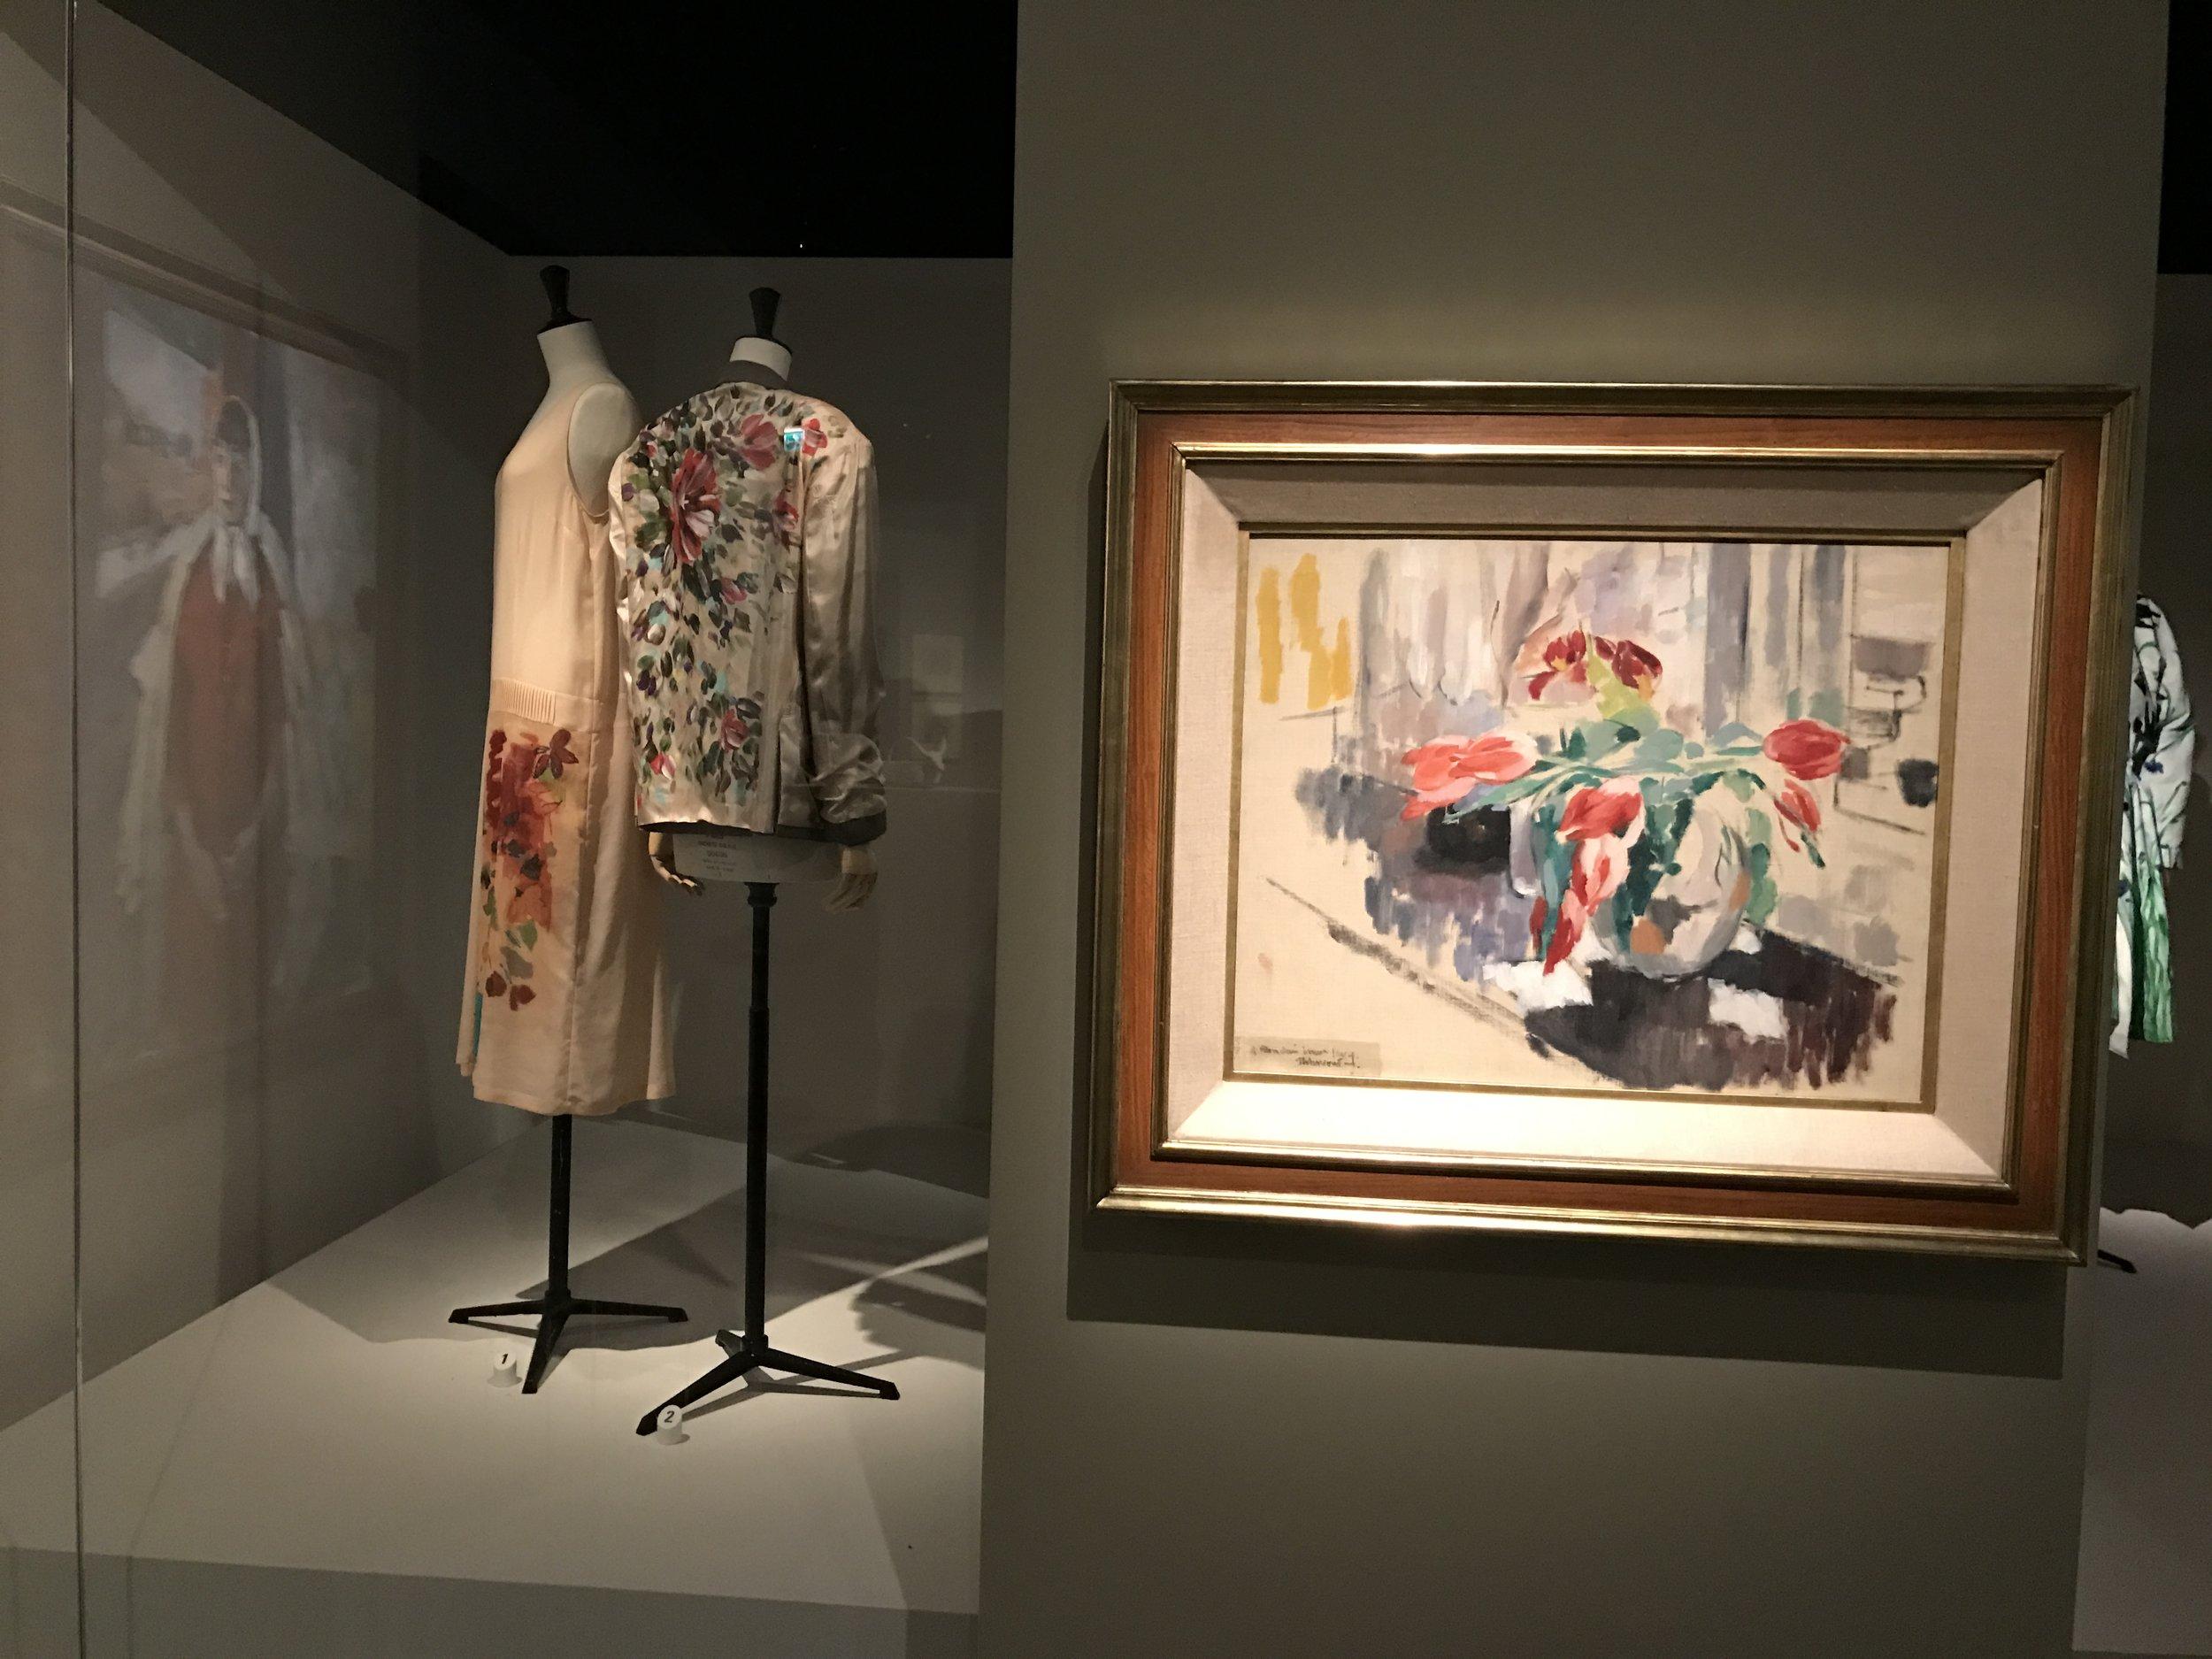 Rik Wouters, ModeMuseum, Antwerpen, De Museumpodcast